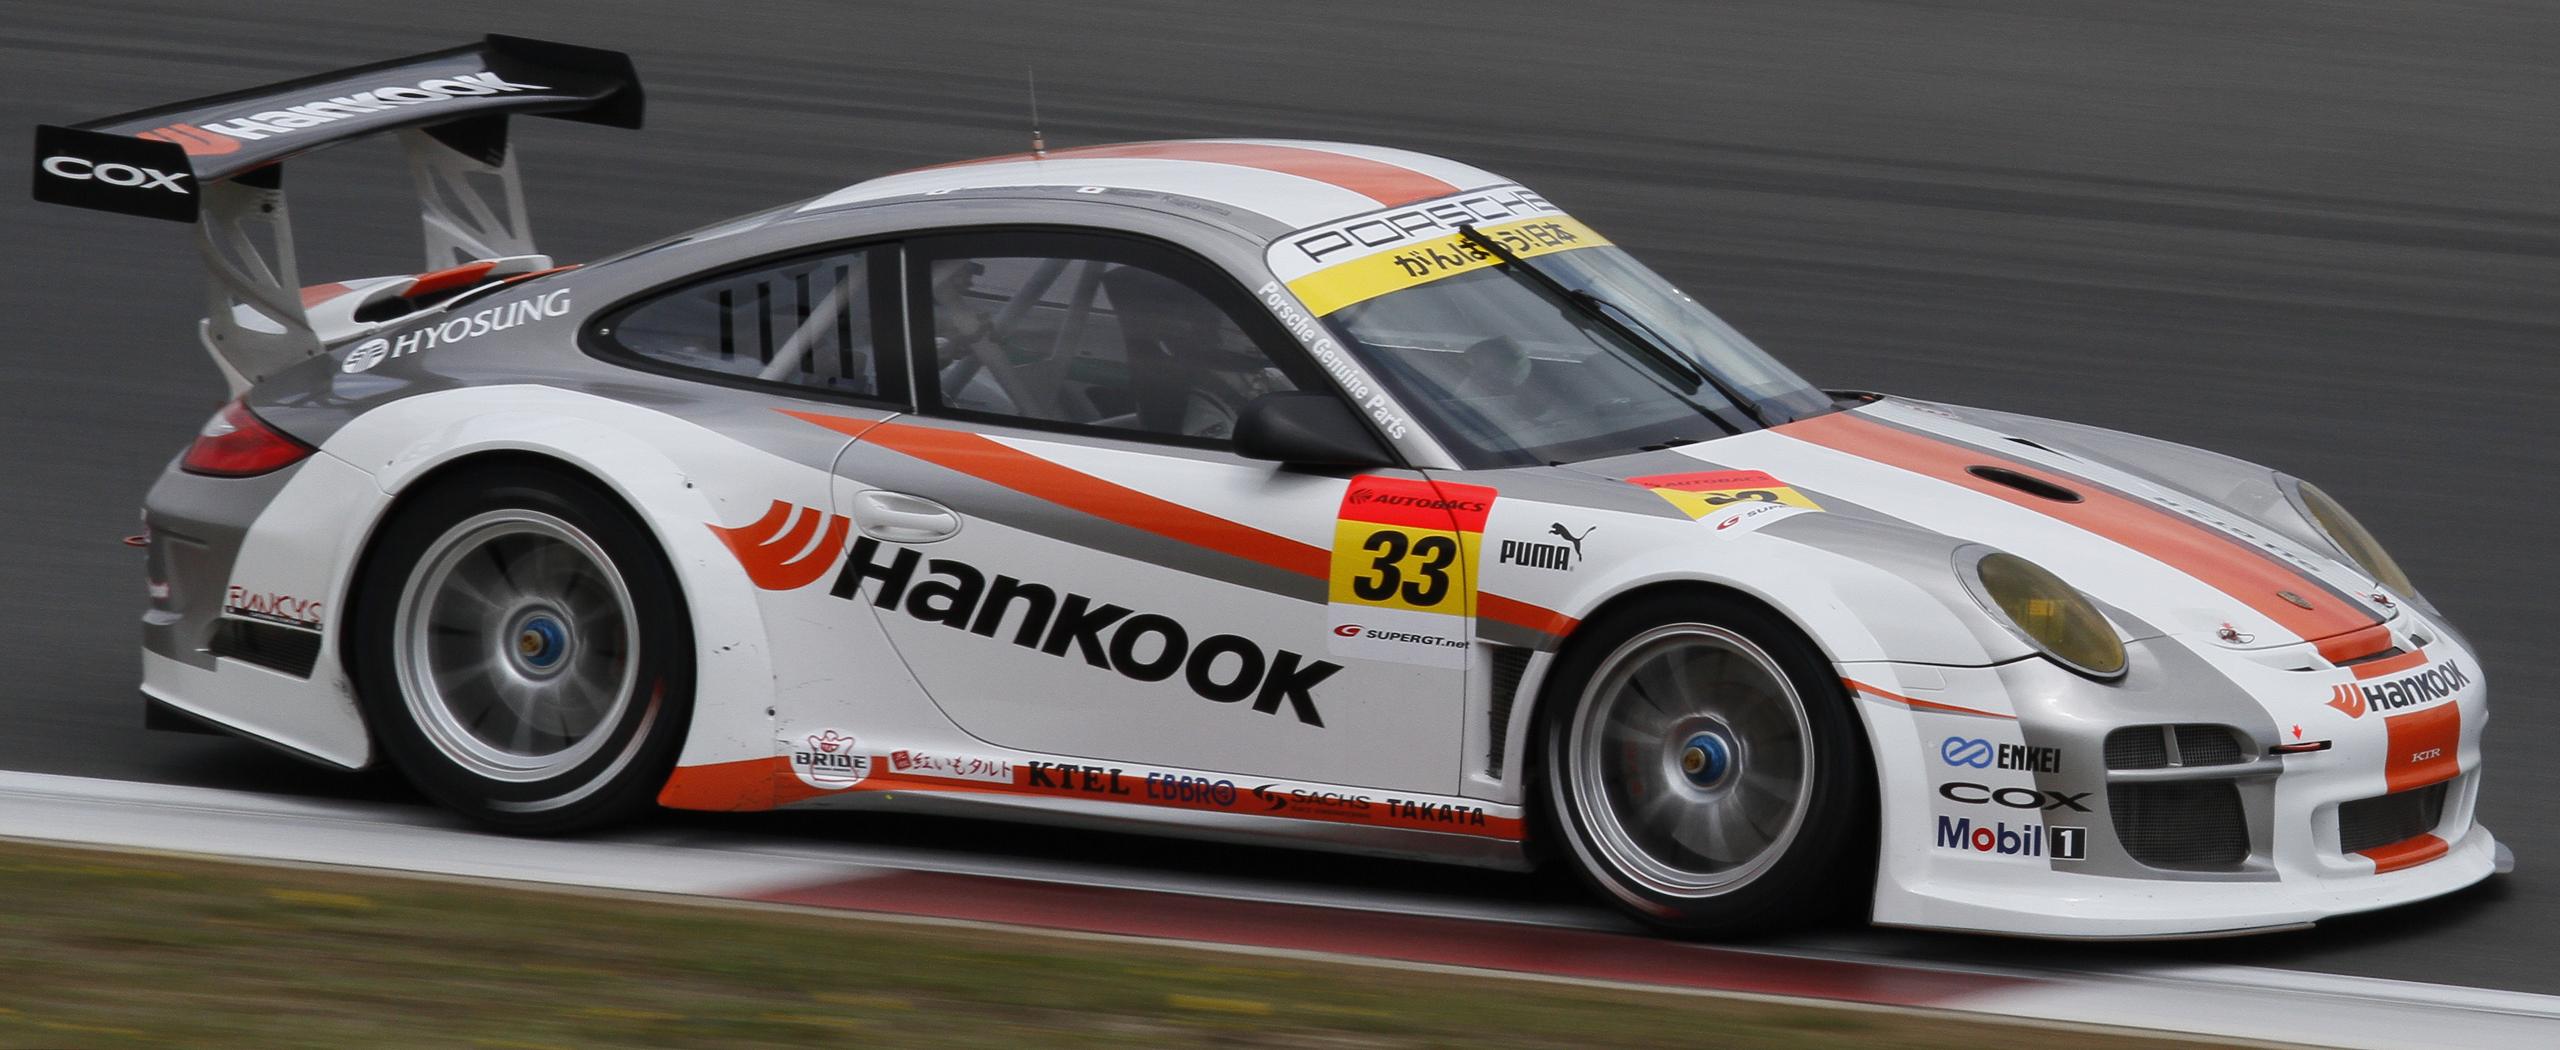 File Hankook Ktr Porsche 911 Gt3r 2011 Fuji Test Jpg